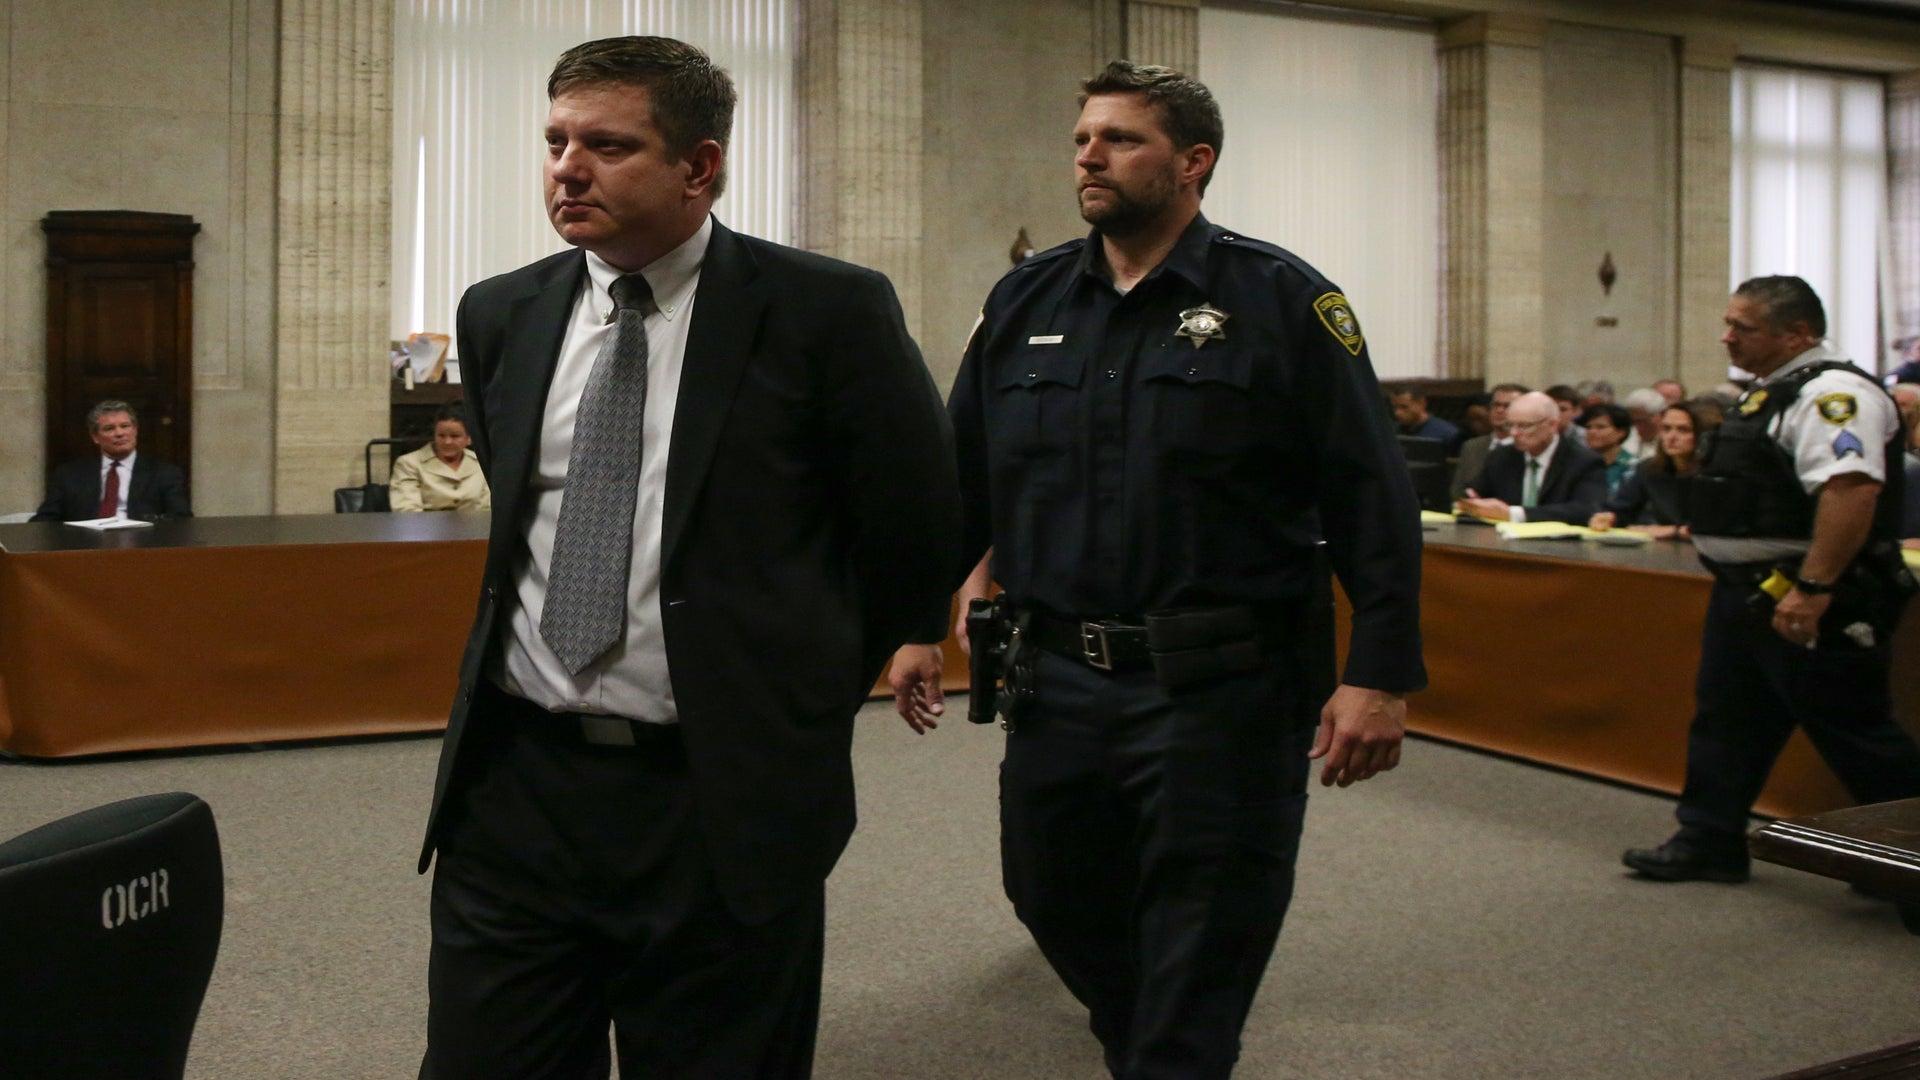 Ex-Cop Responsible For Killing Laquan McDonald, Attacked In Prison